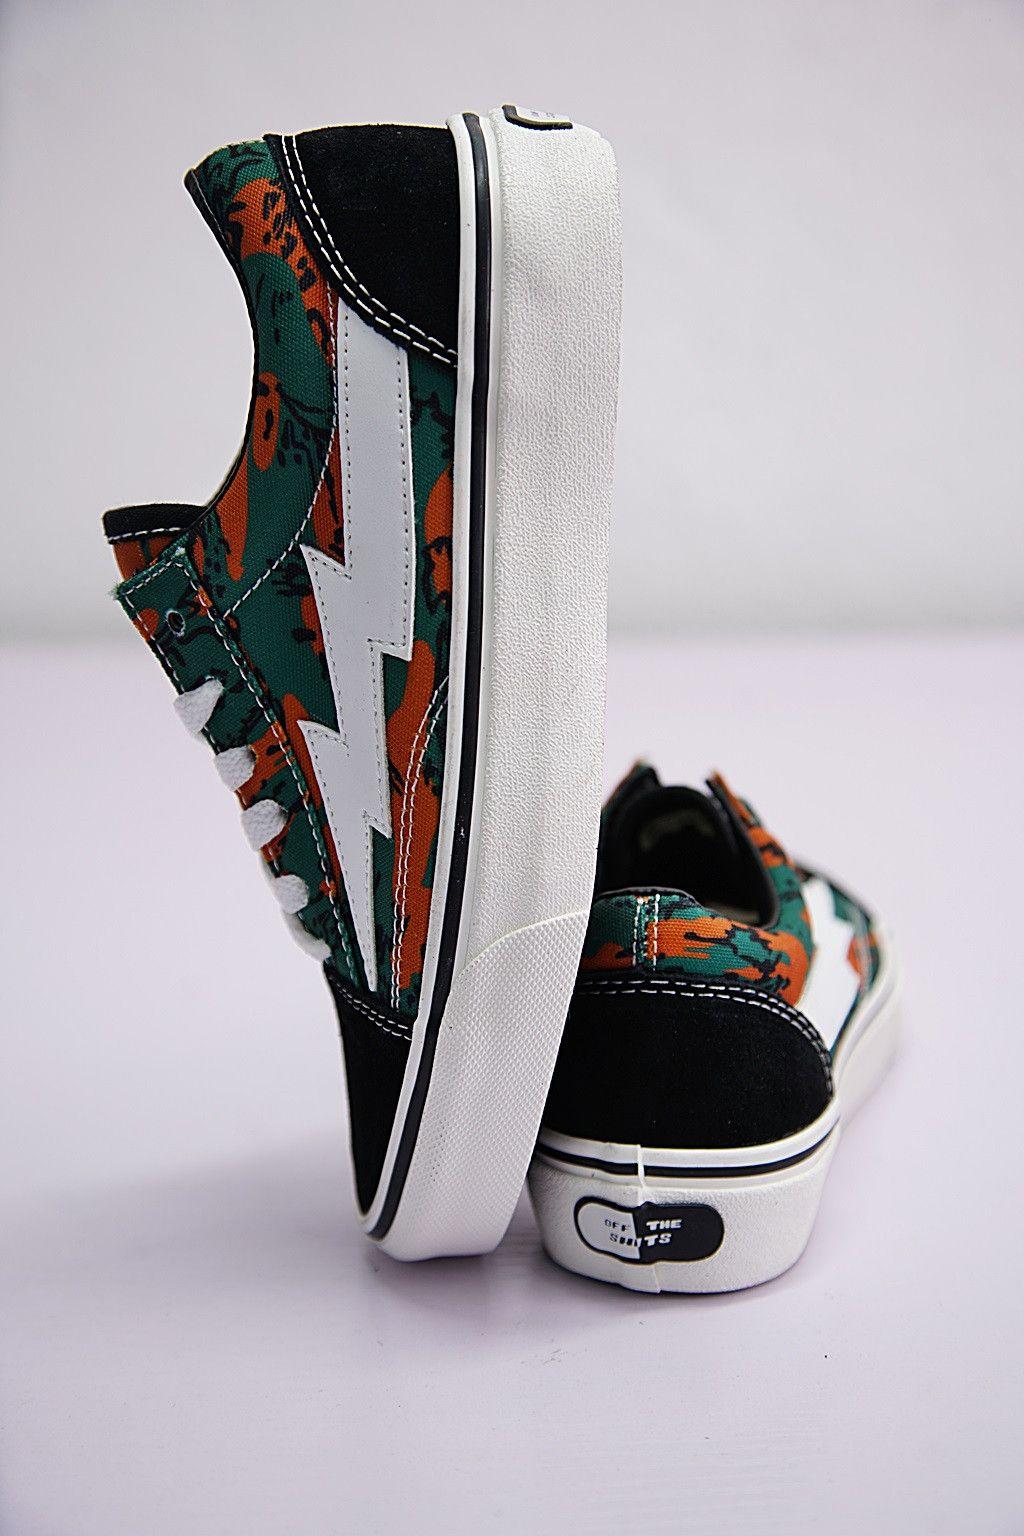 Vans Revenge X Storm Dark Green Orange Camouflage 008243210 Vans Shoes Fashion Vans Shoes Custom Vans Shoes